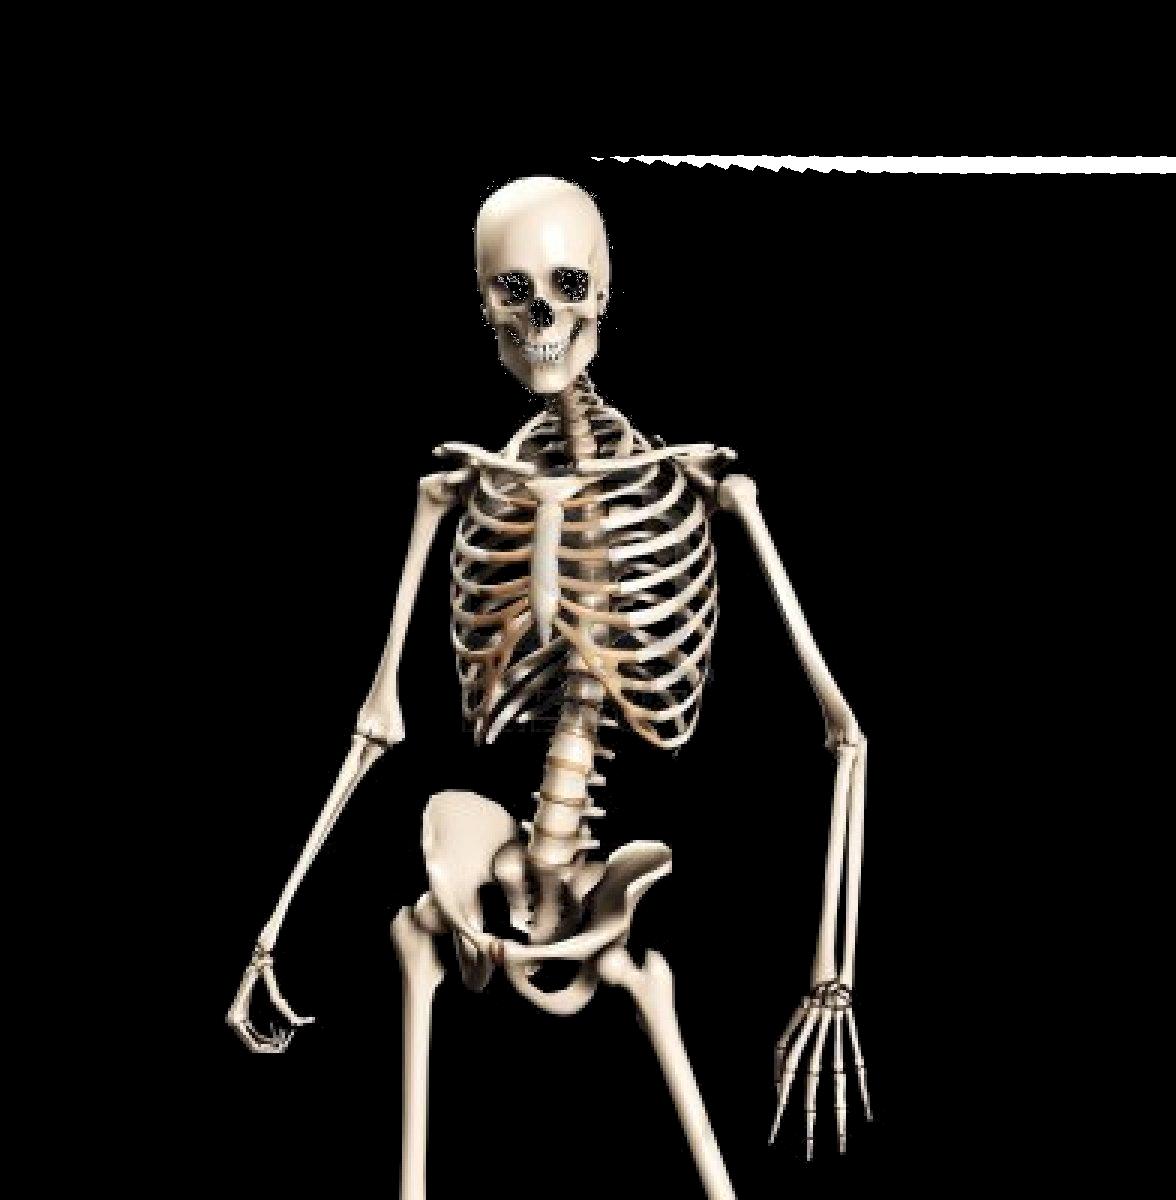 Skeleton, Bones, Anatomy, Human png